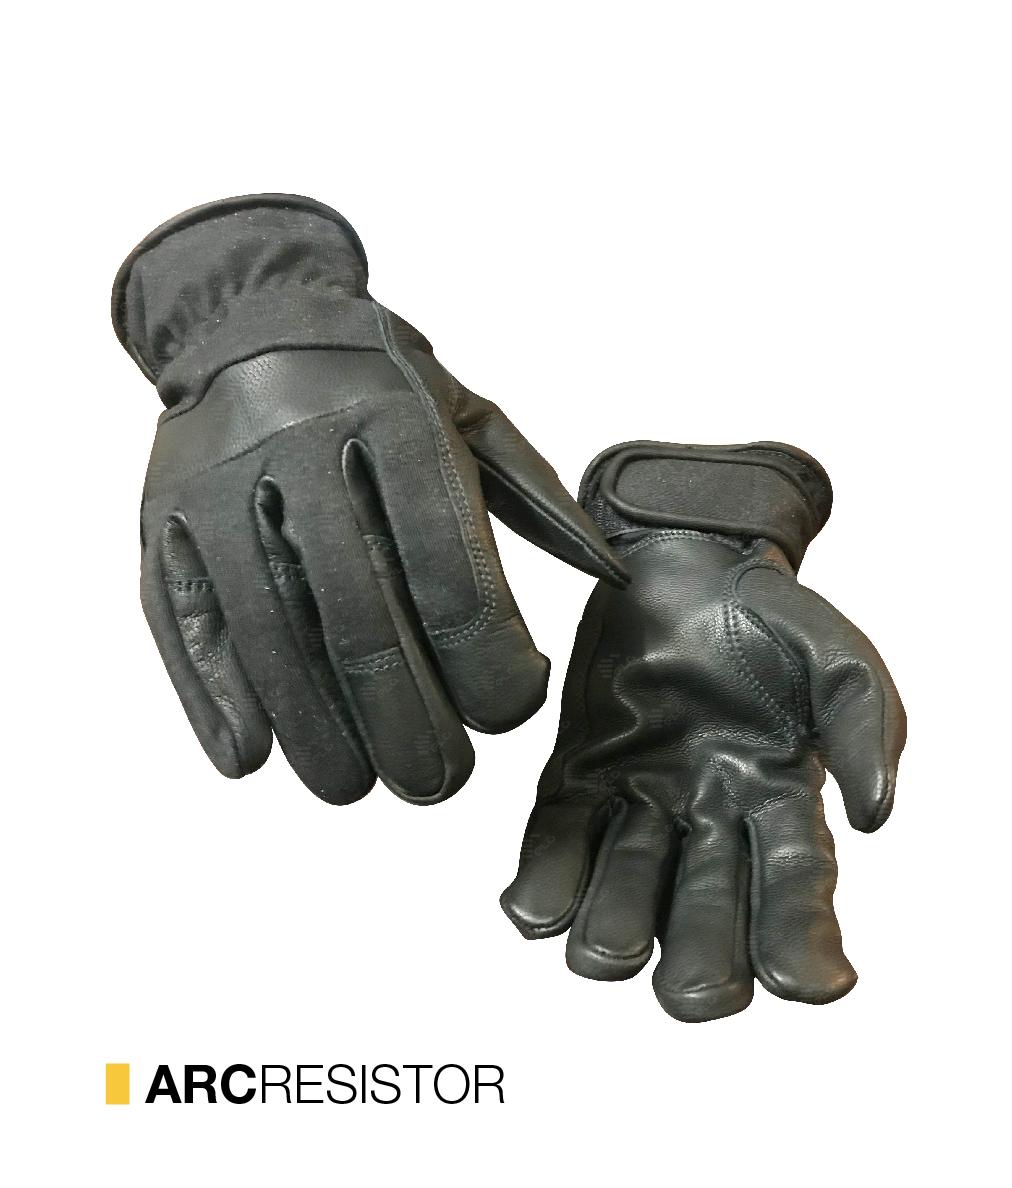 ARCRESISTOR cut-resistant gloves by elite leather